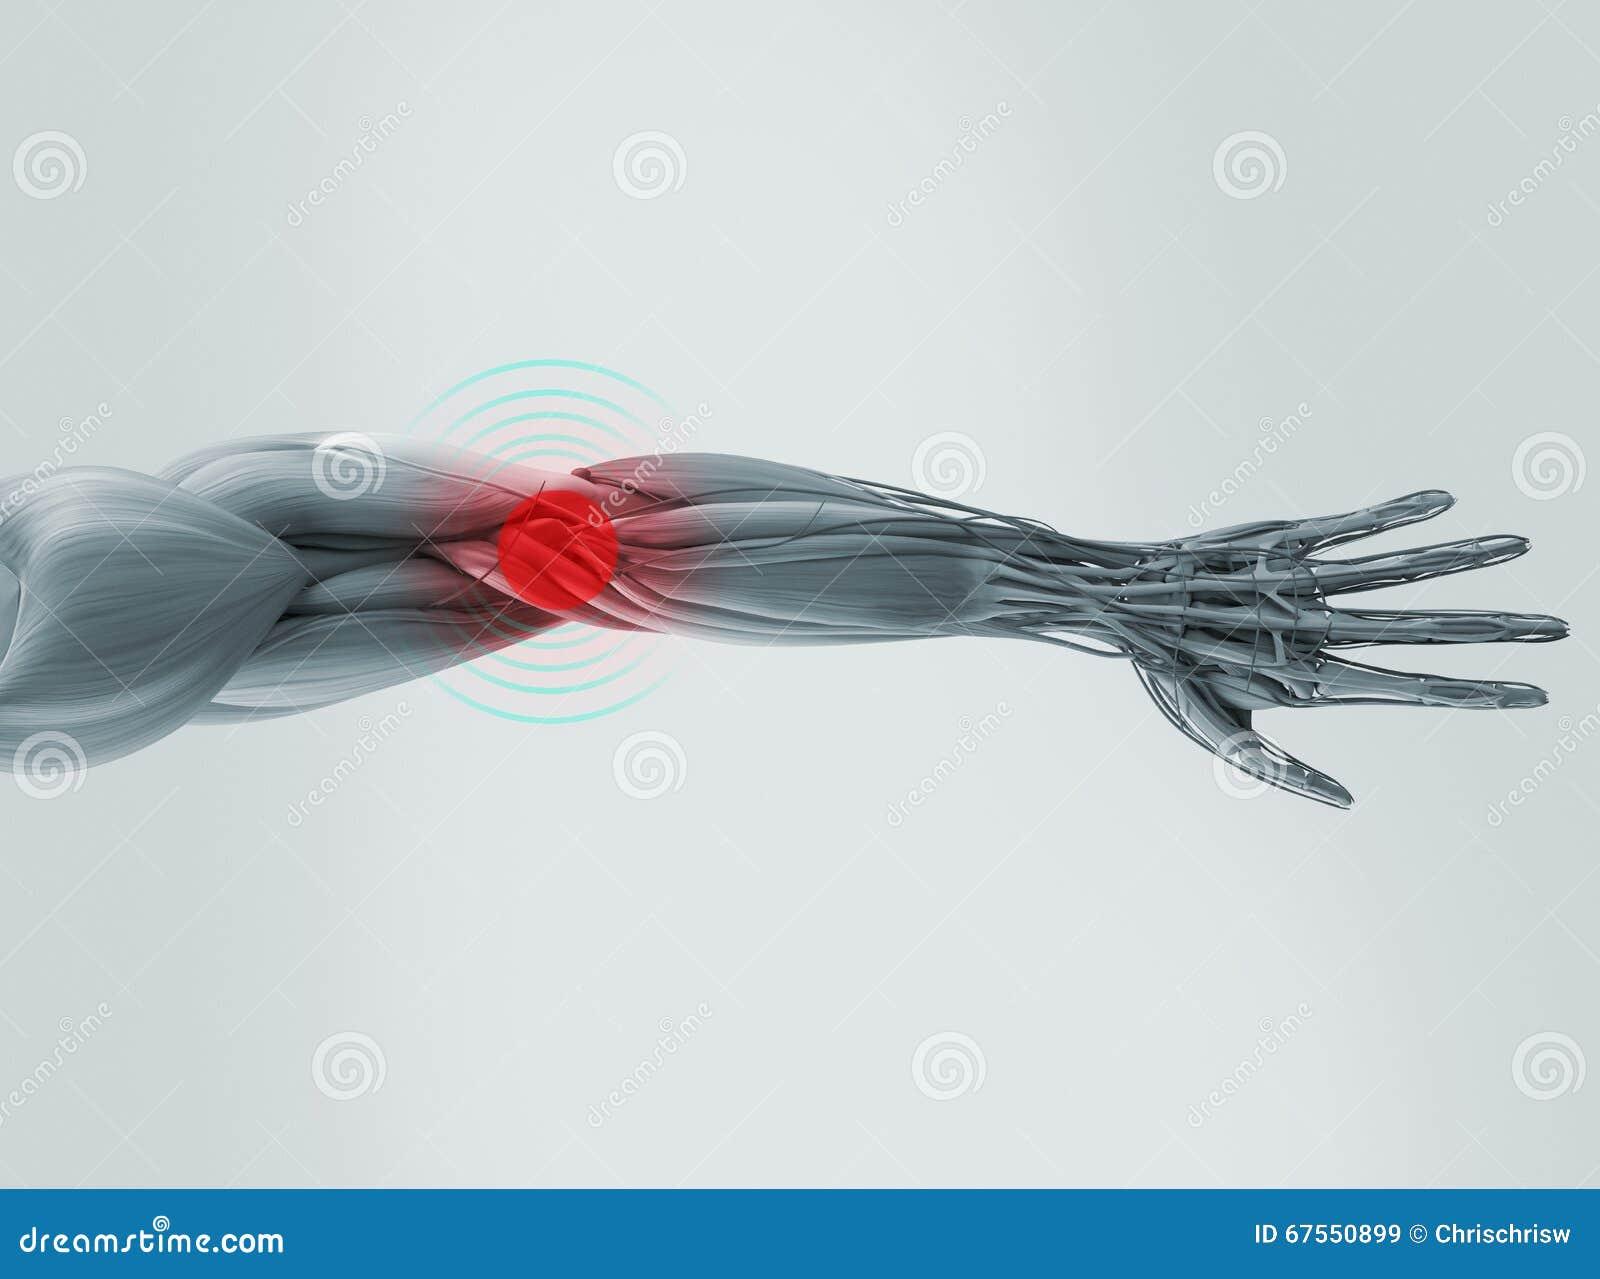 Anatomy Model Showing Elbow Pain. Stock Illustration - Illustration ...